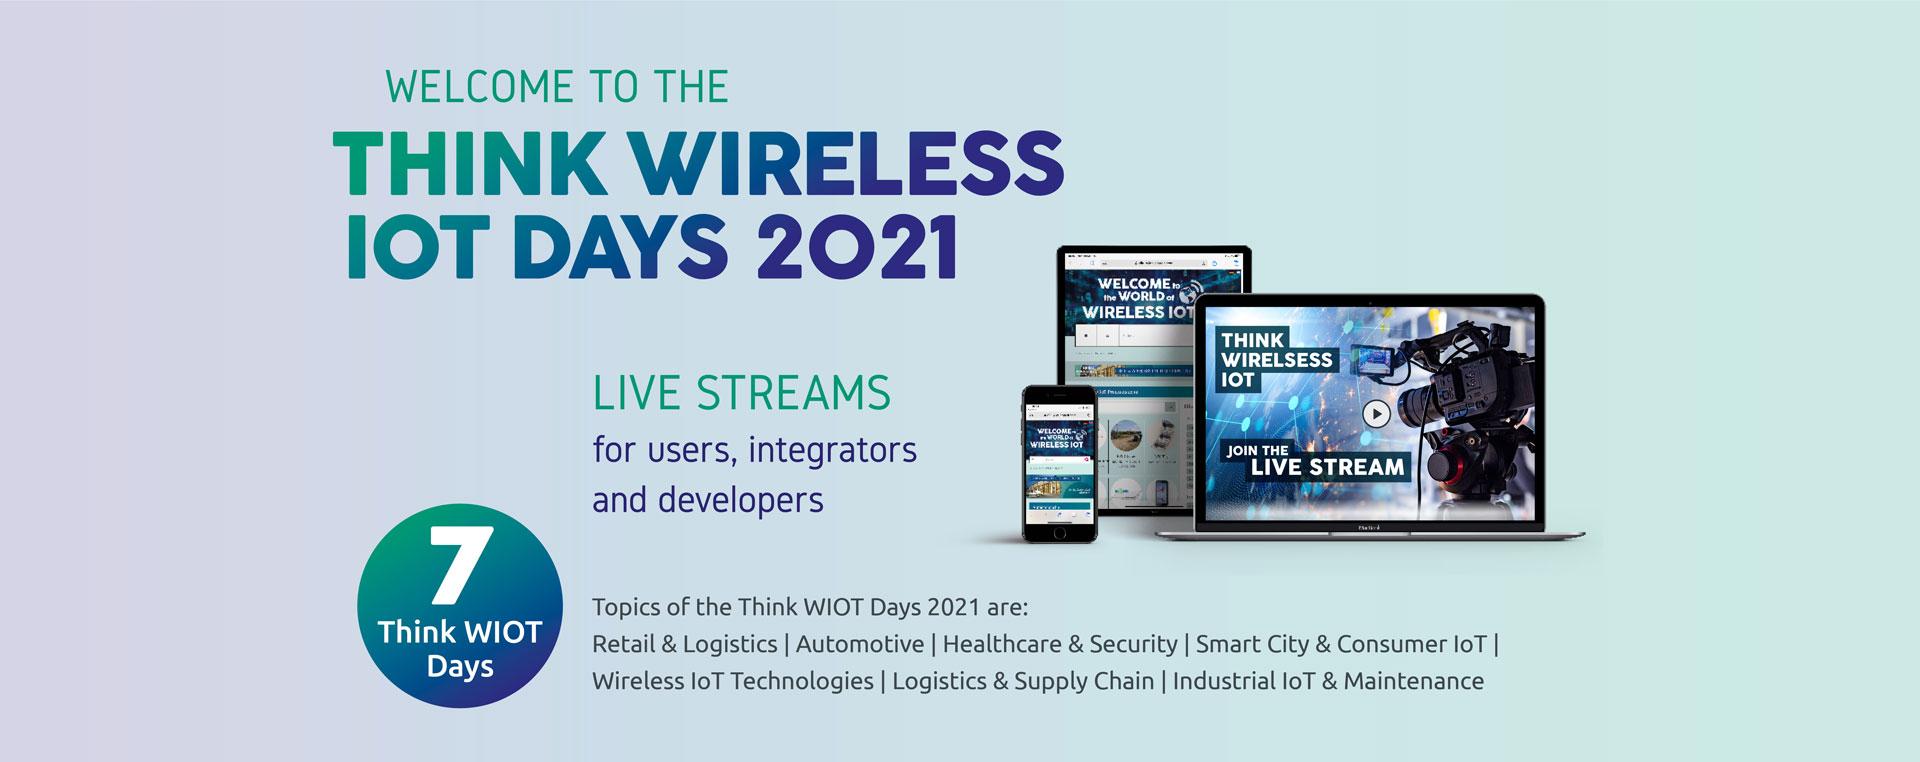 Think Wireless IoT Days